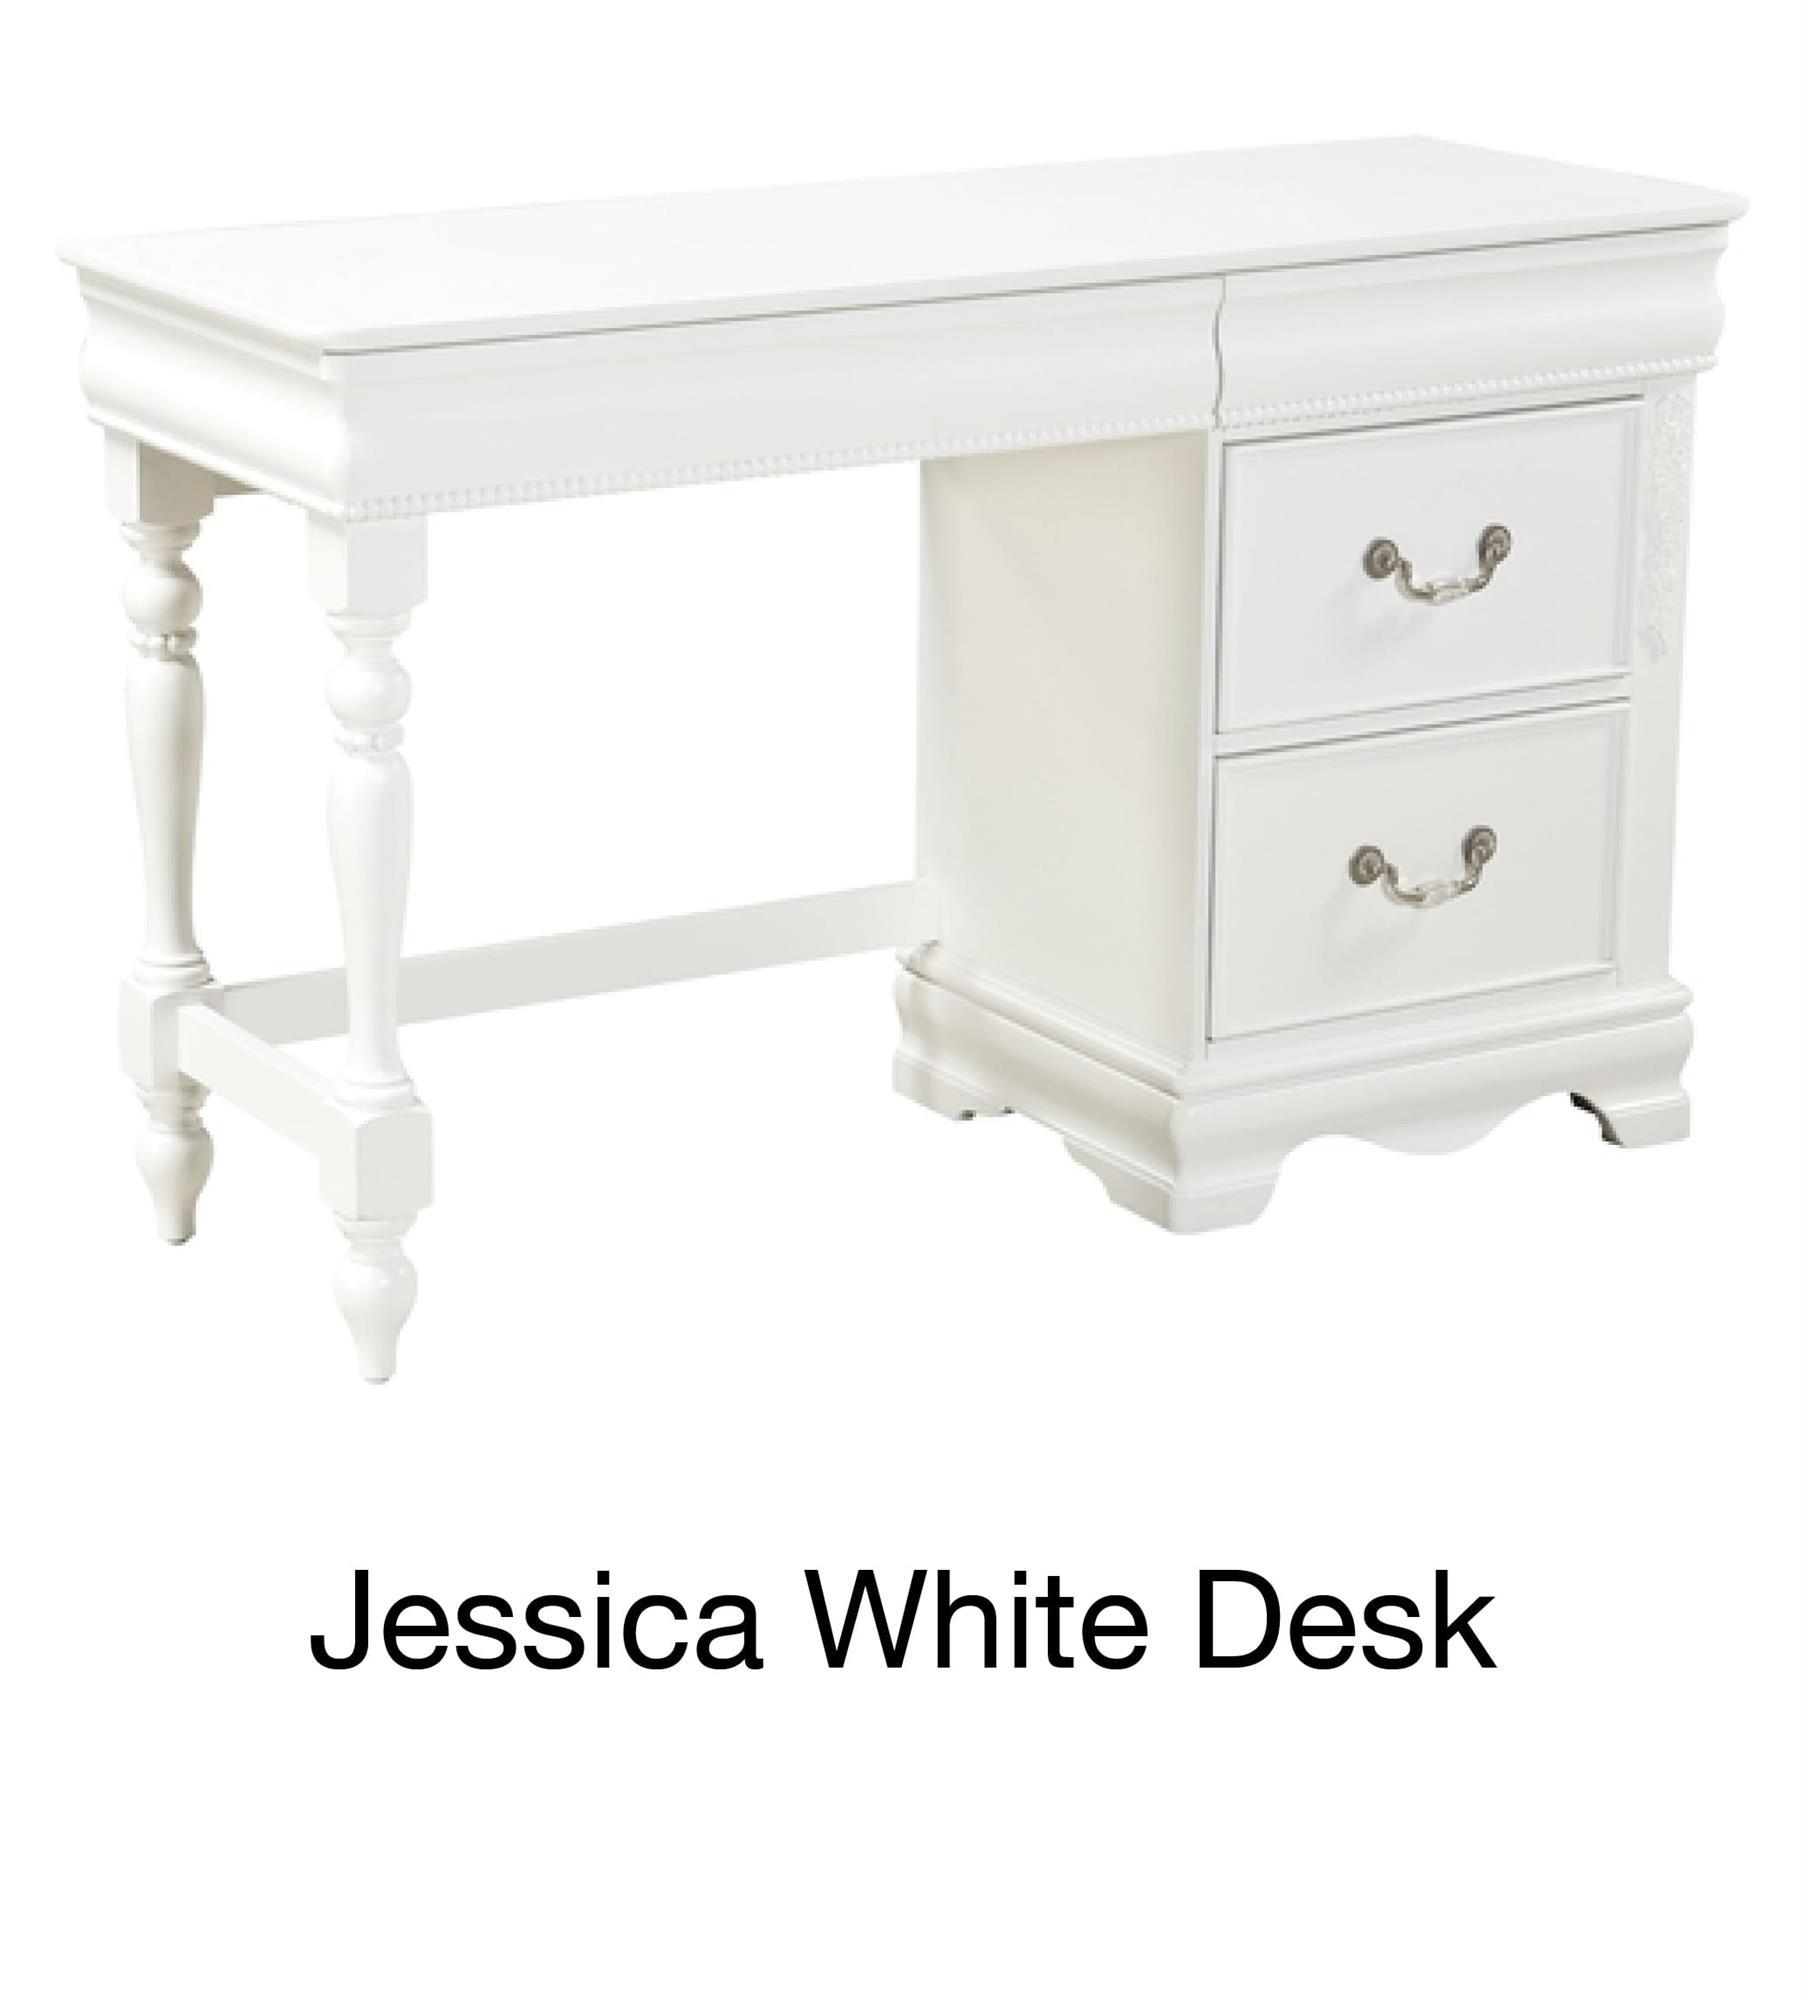 Jessica White Desk